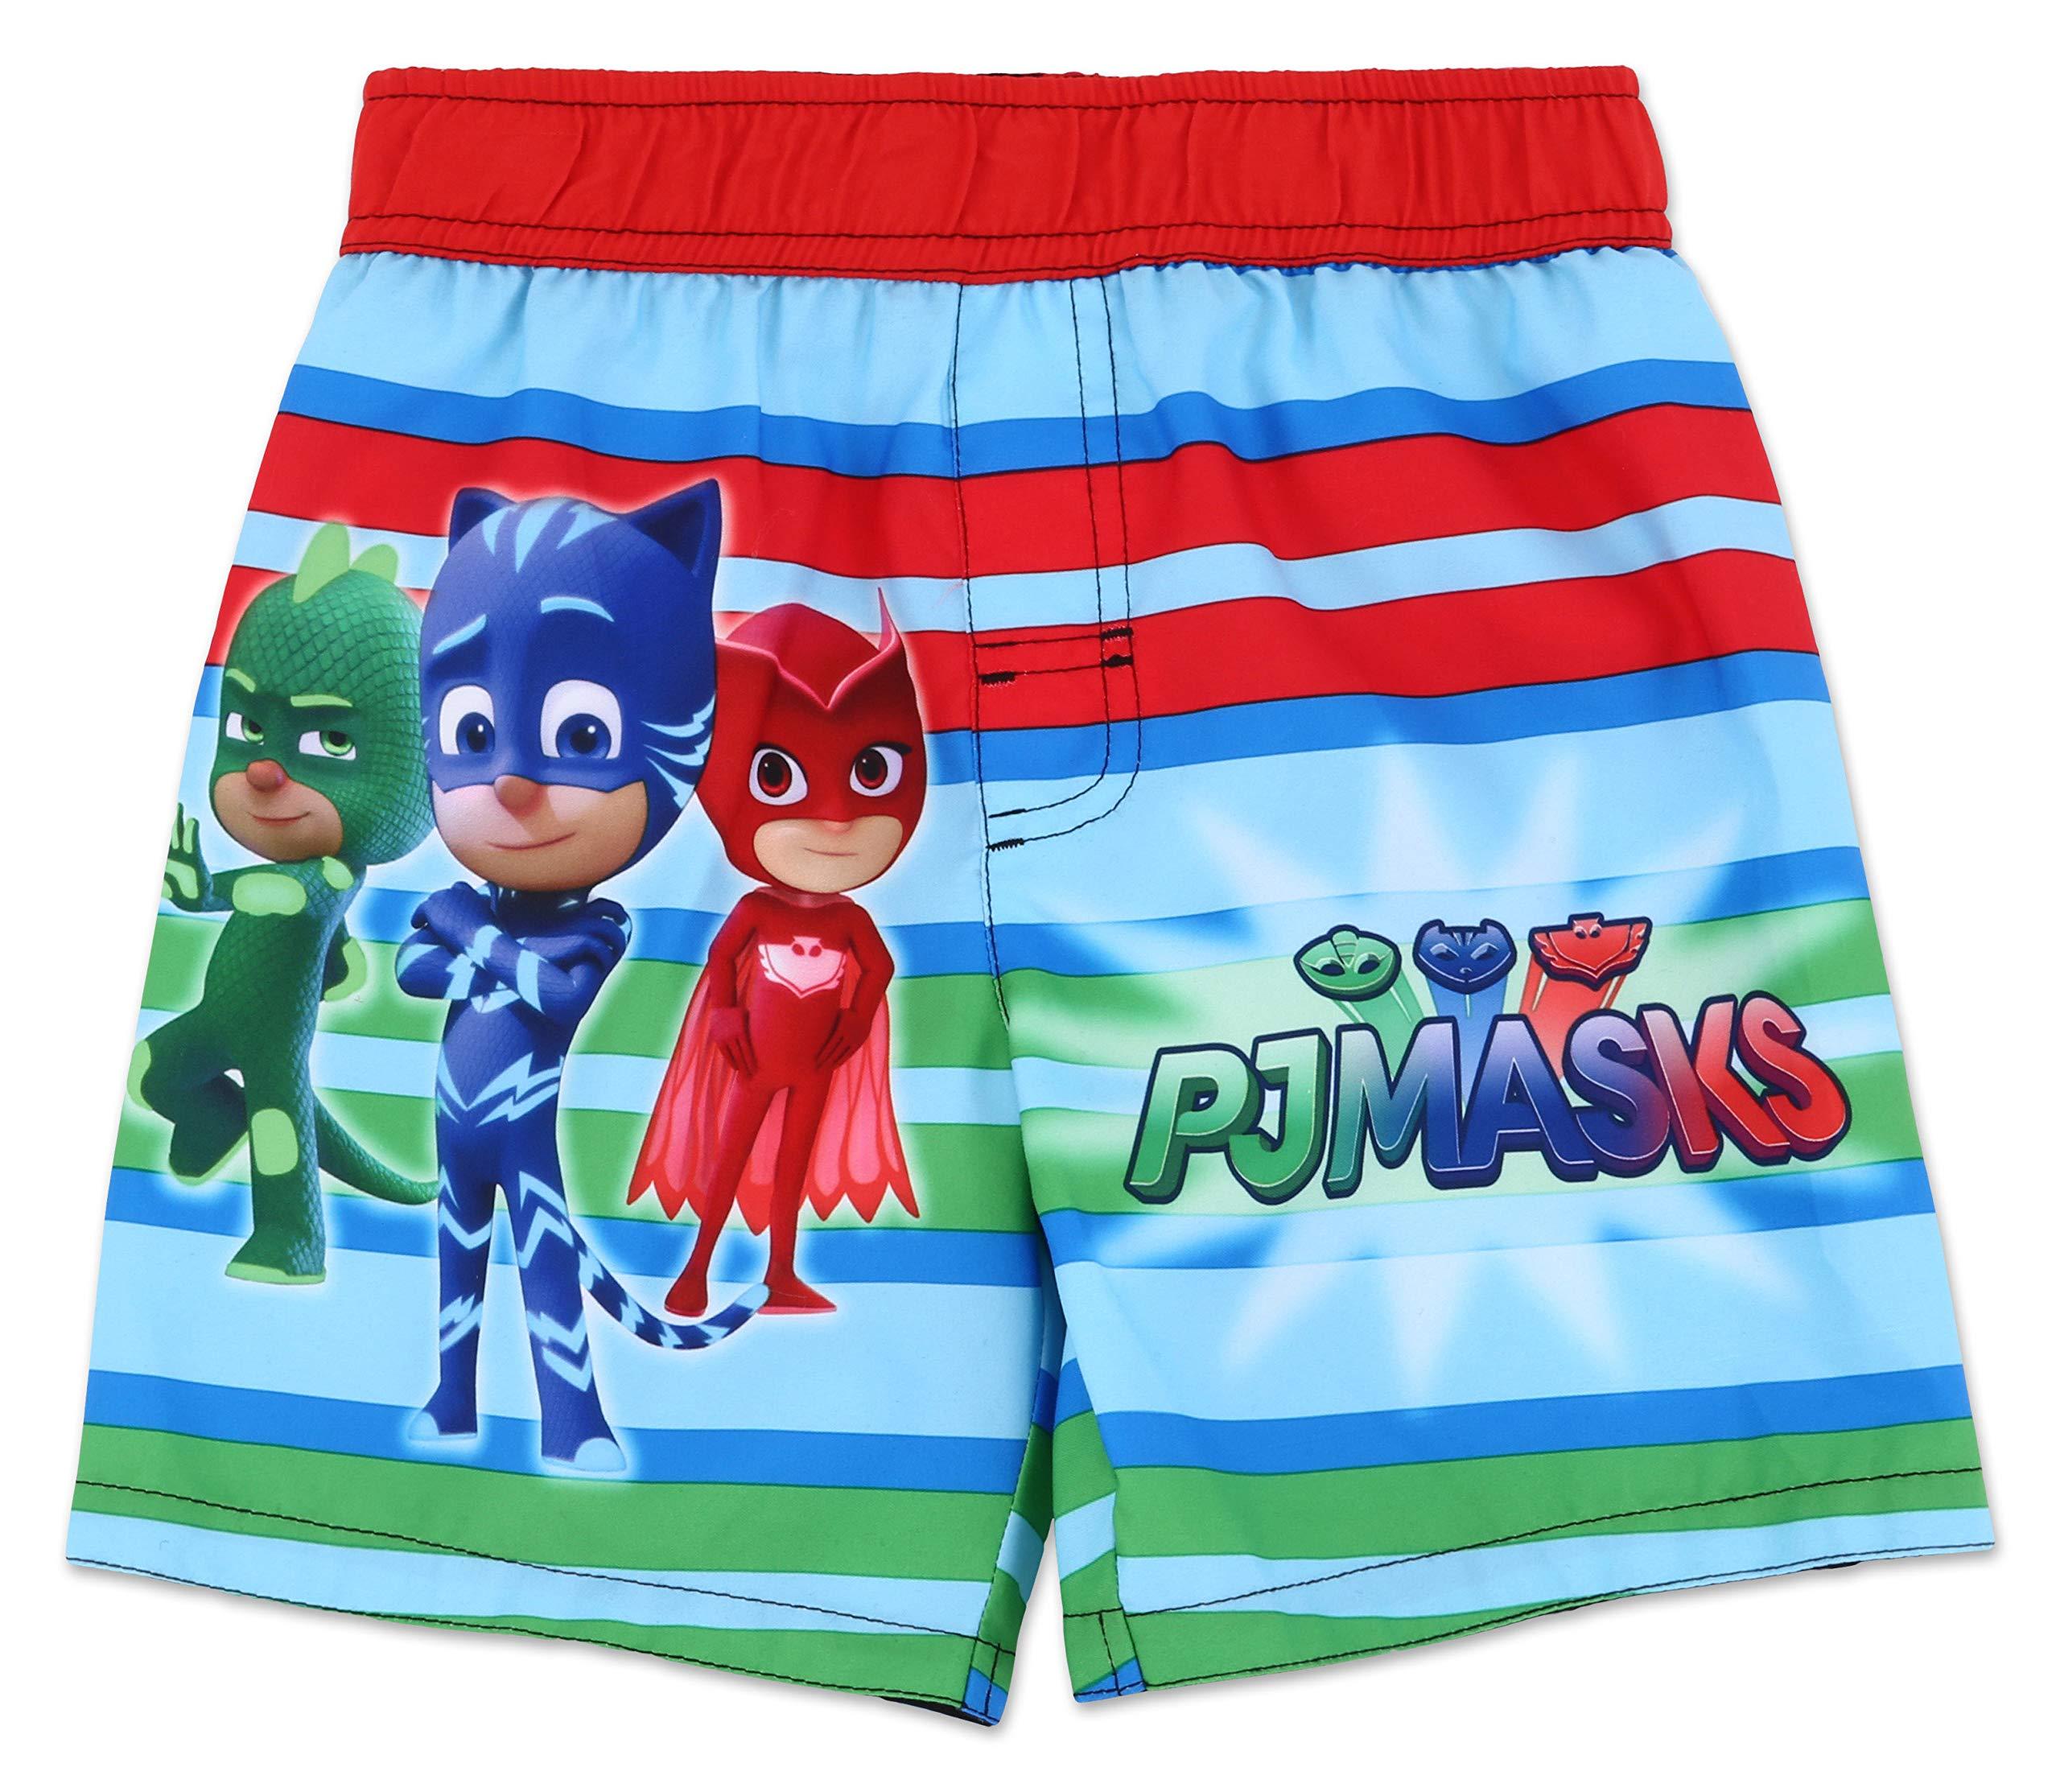 Toddler Boy PJ Masks Swim Trunk 4T